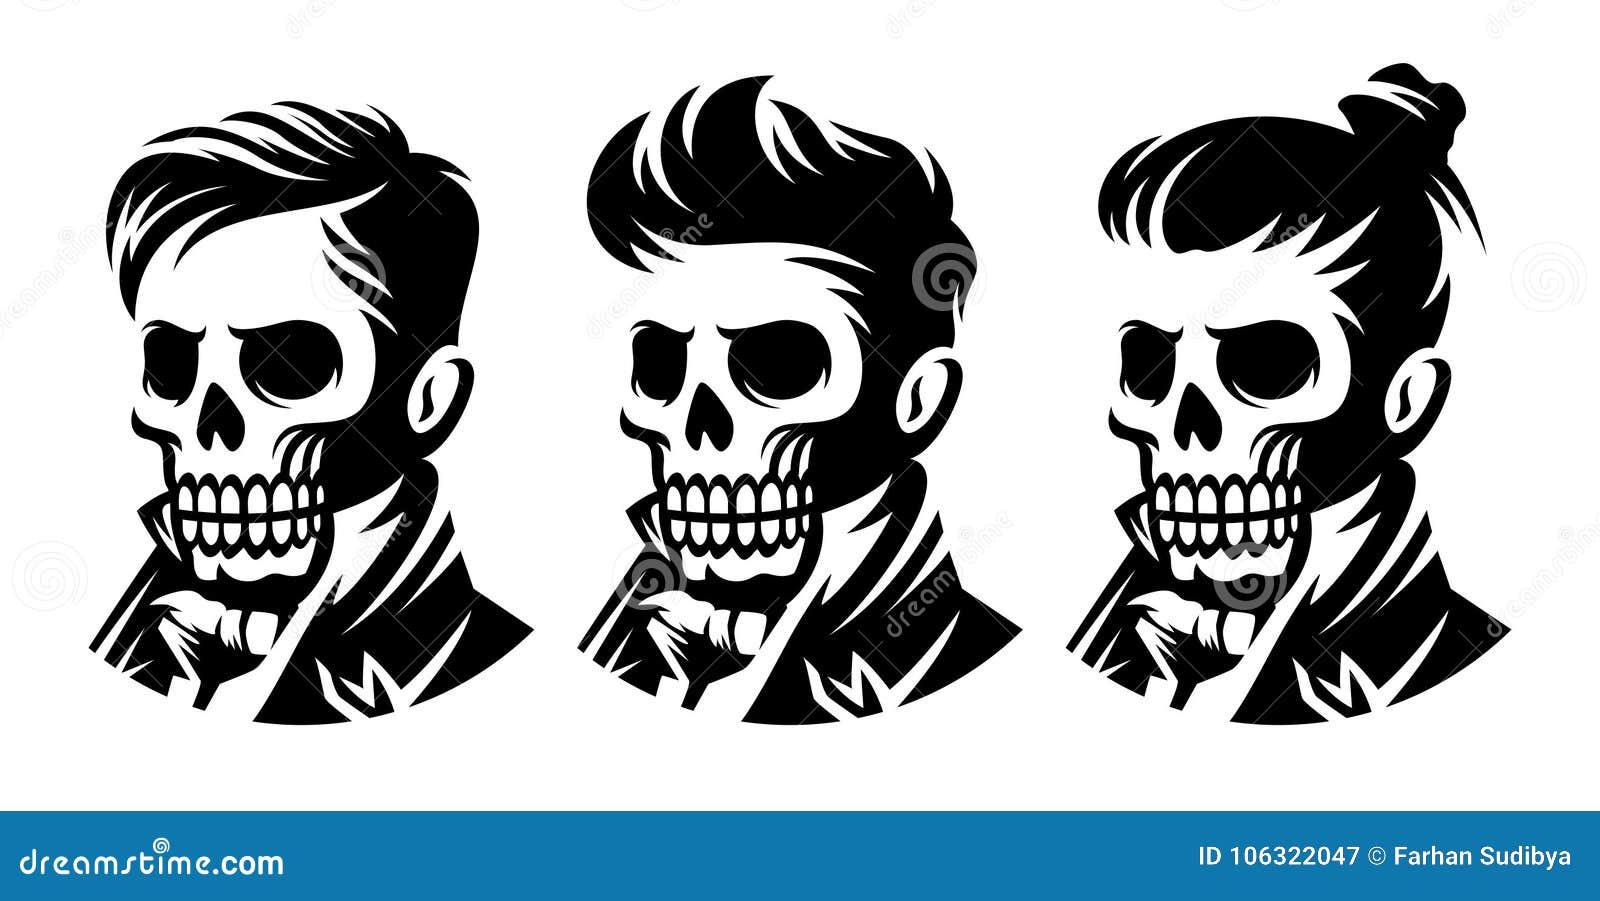 Set Skull Barbershop Victorian Hairstyle Haircut Illustration Stock